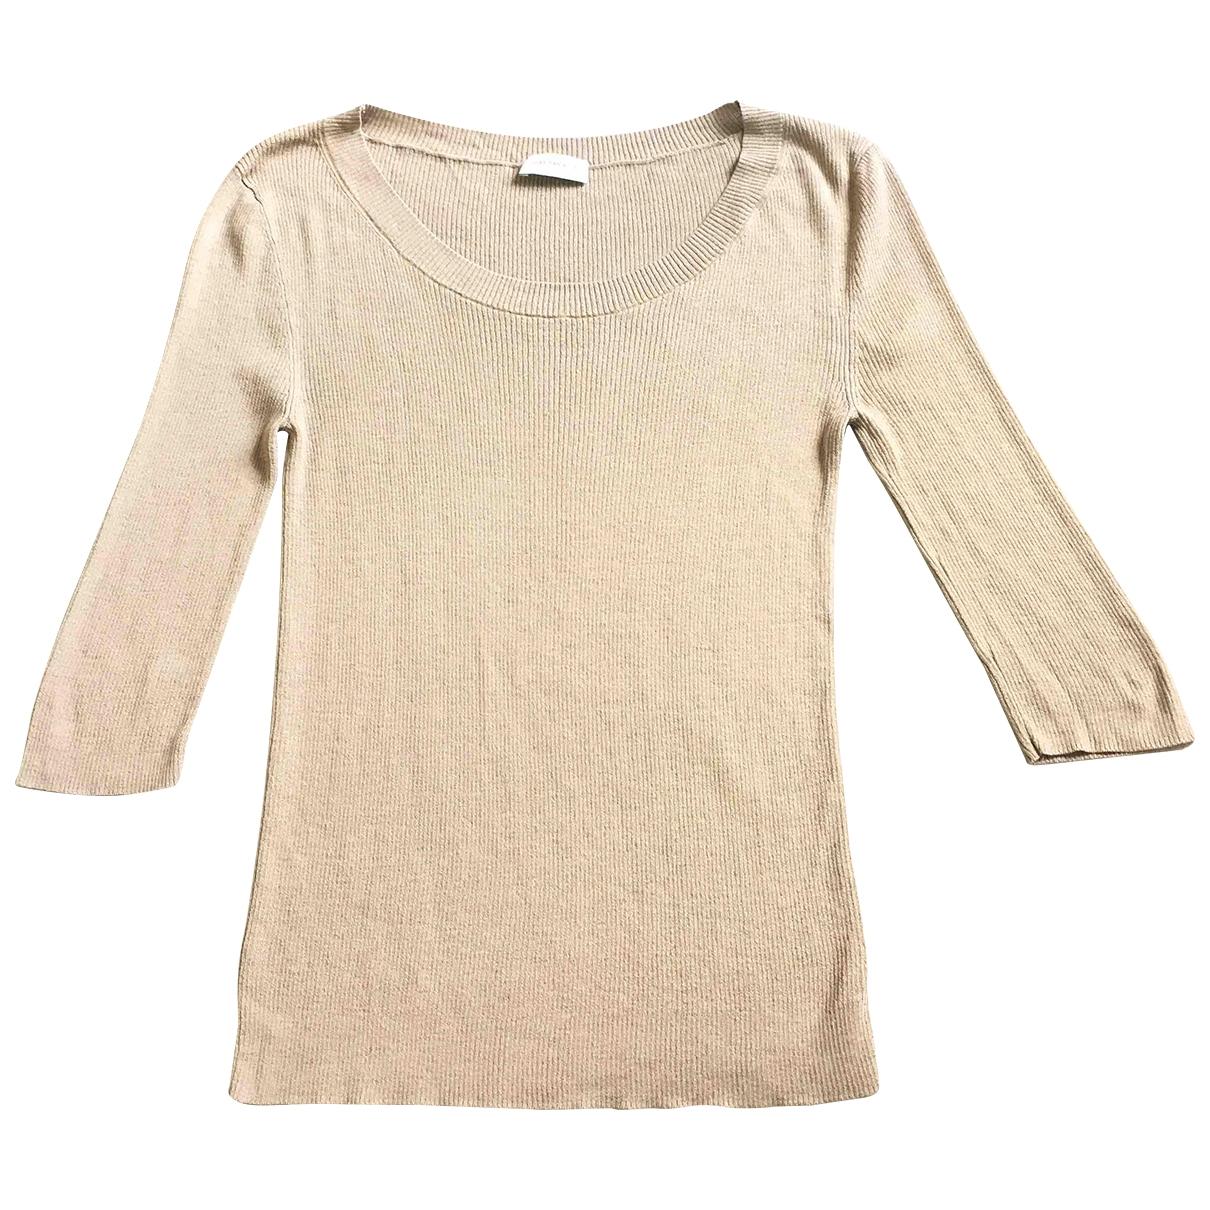 Dries Van Noten - Pull   pour femme en laine - beige